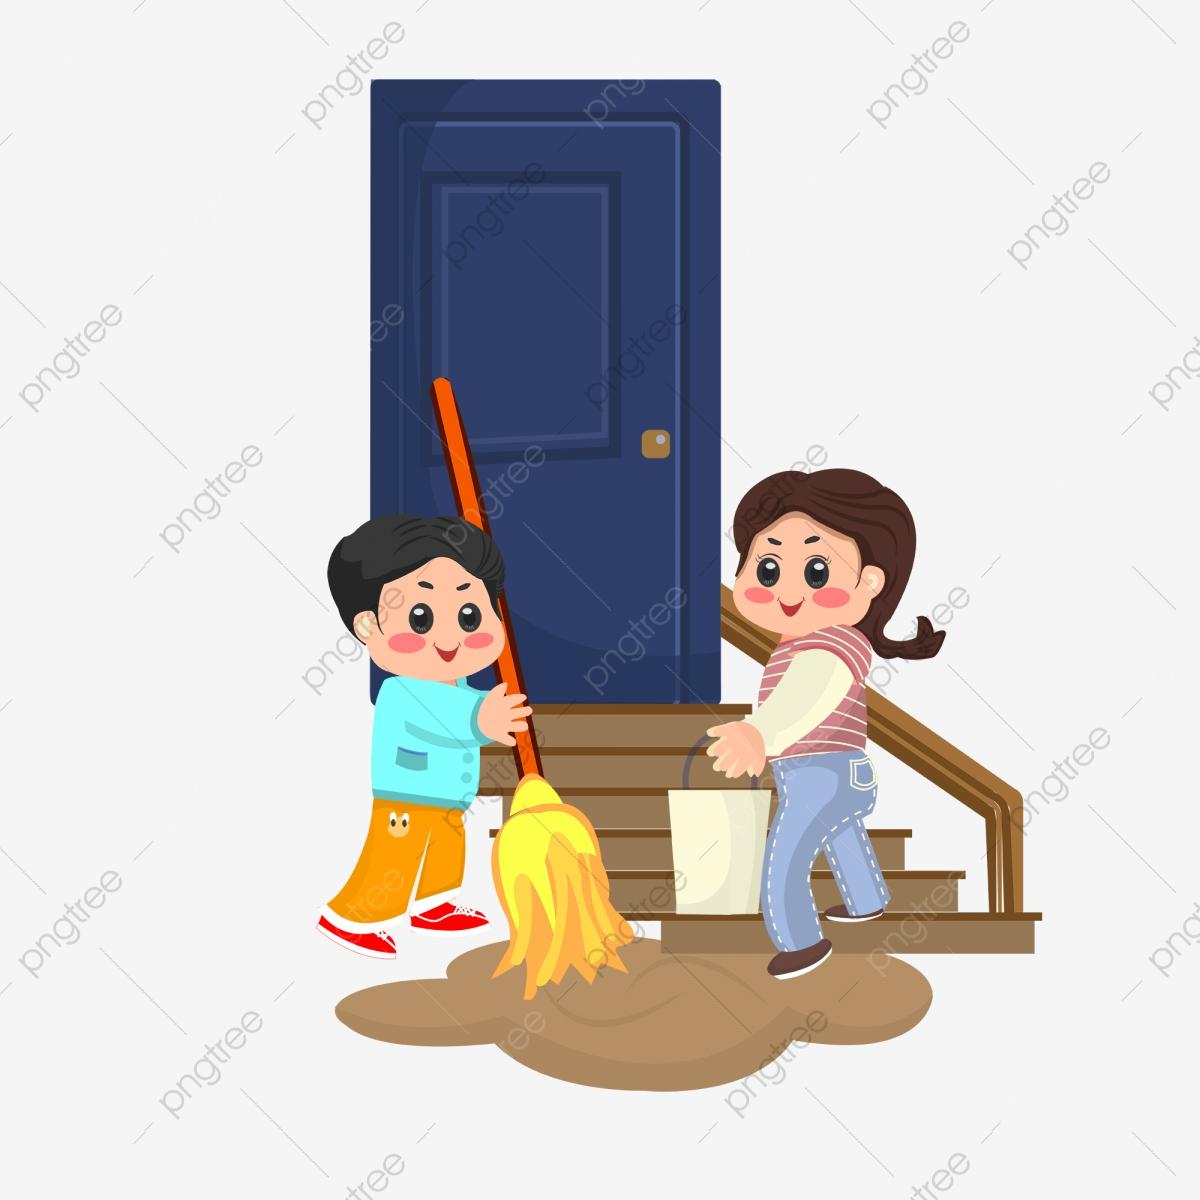 Community Service Clean Community Mop Clean Up Dirty Water, Doorway.